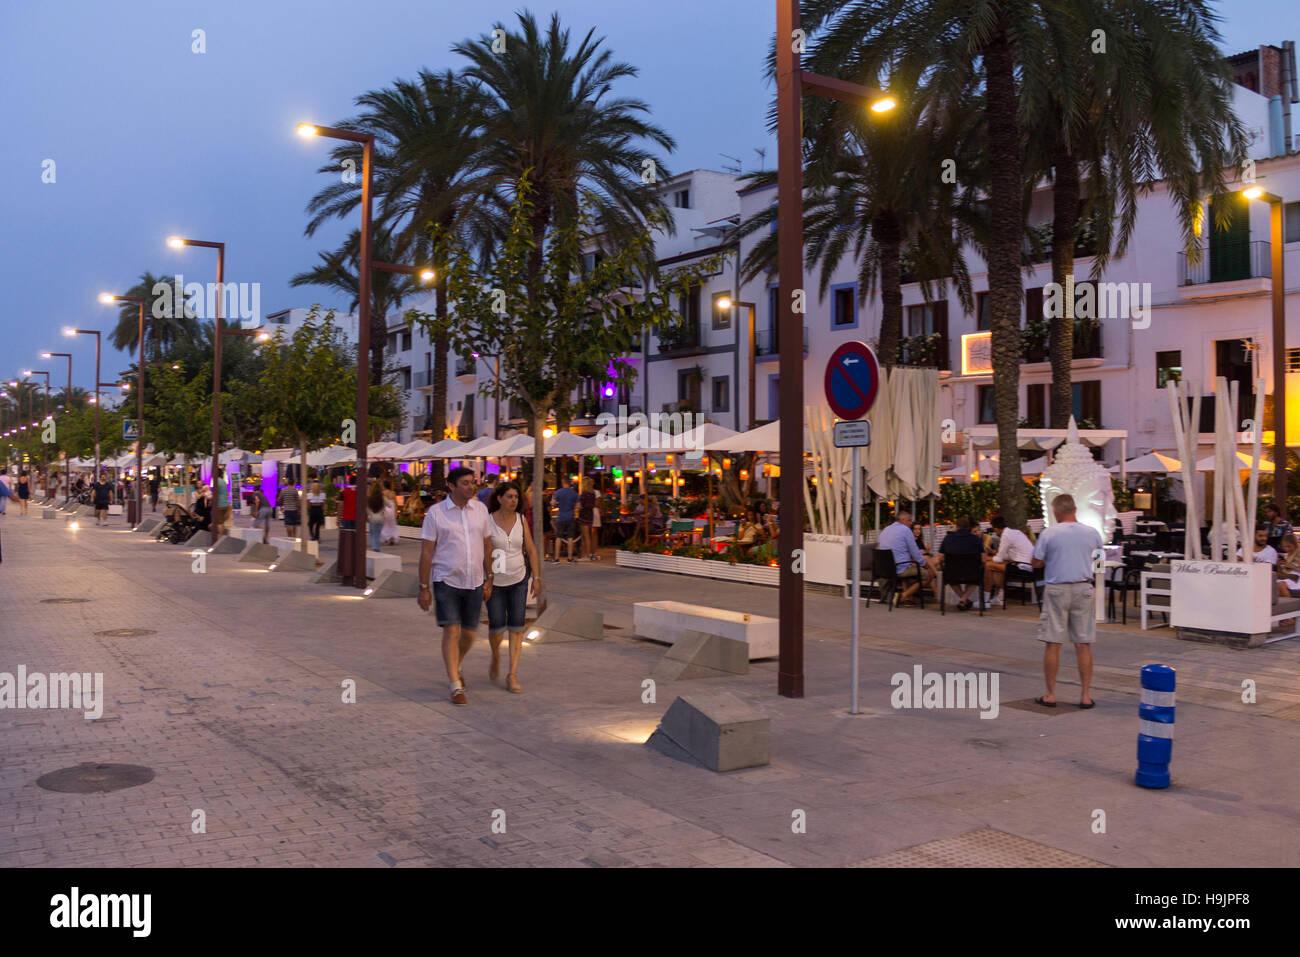 Spain, Balearic Islands, Ibiza, Eivissa, the promenade - Stock Image